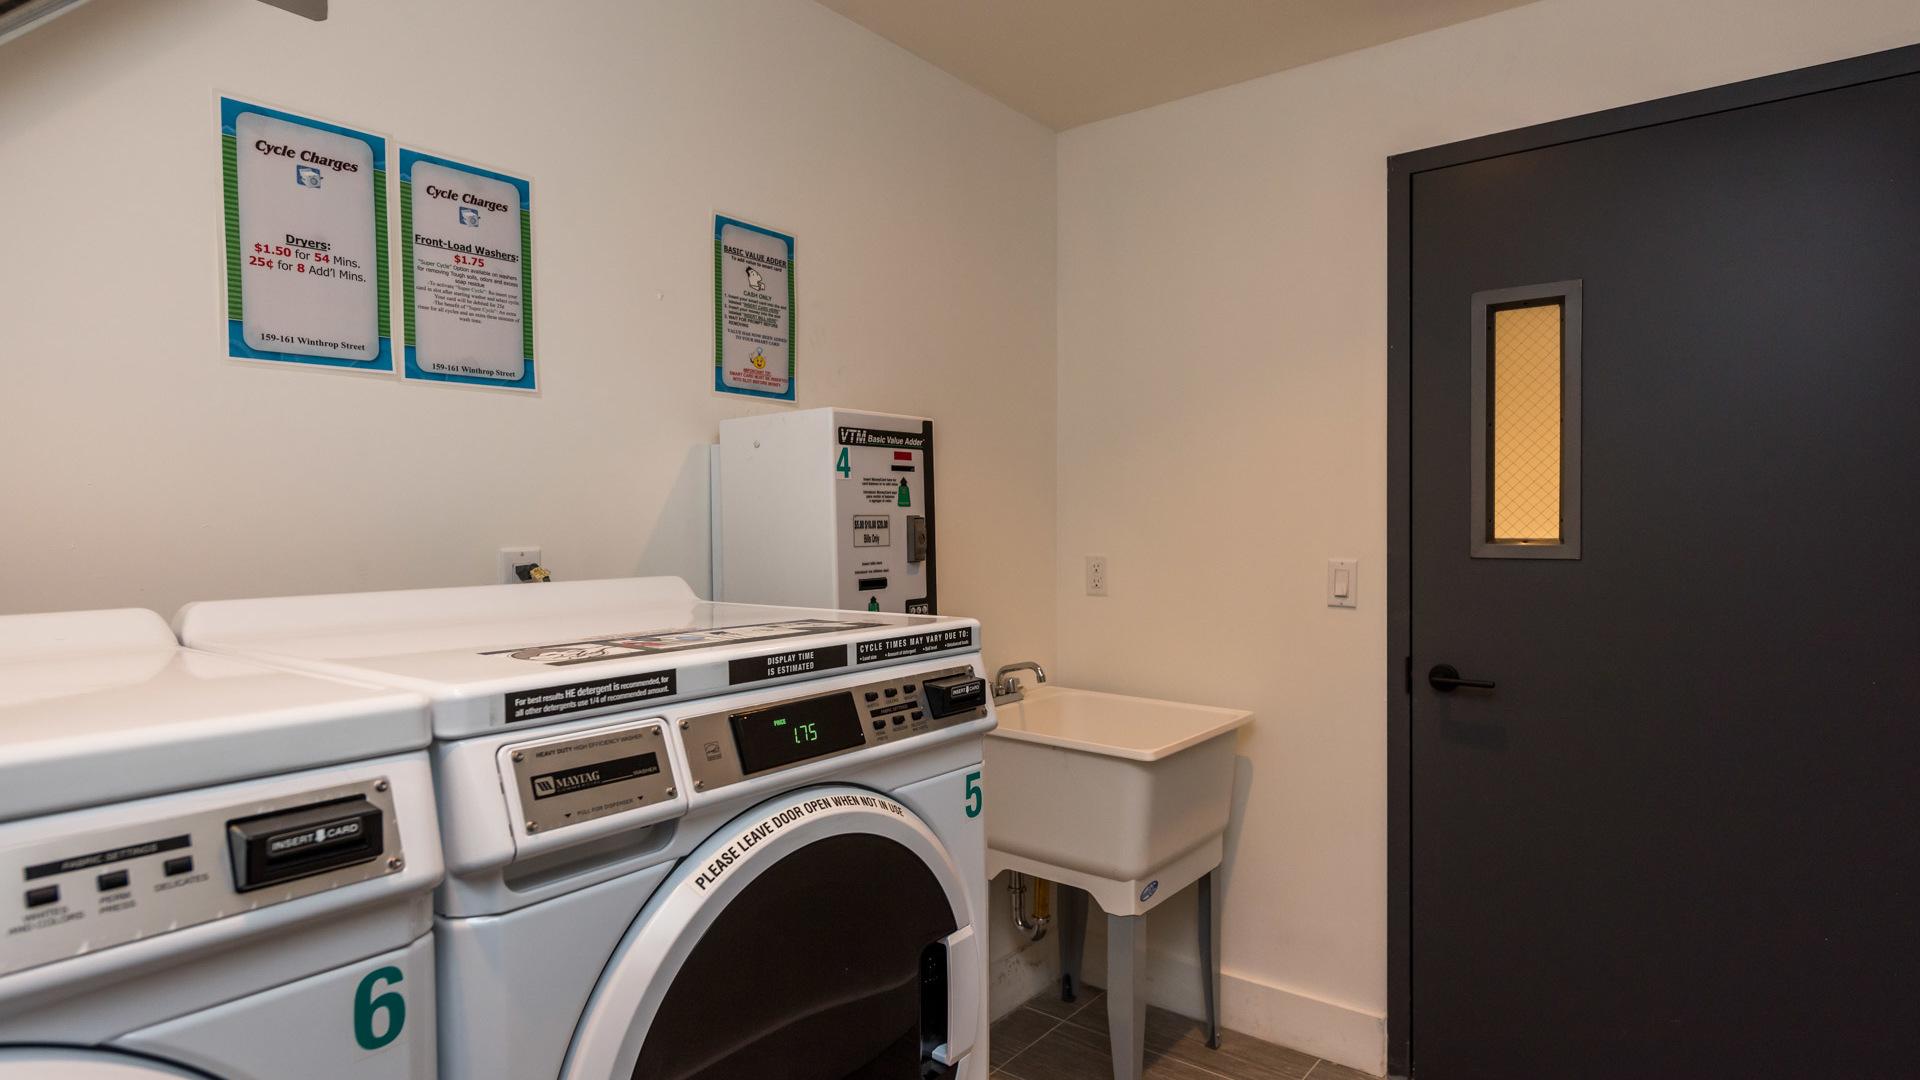 161 winthrop street laundry 2